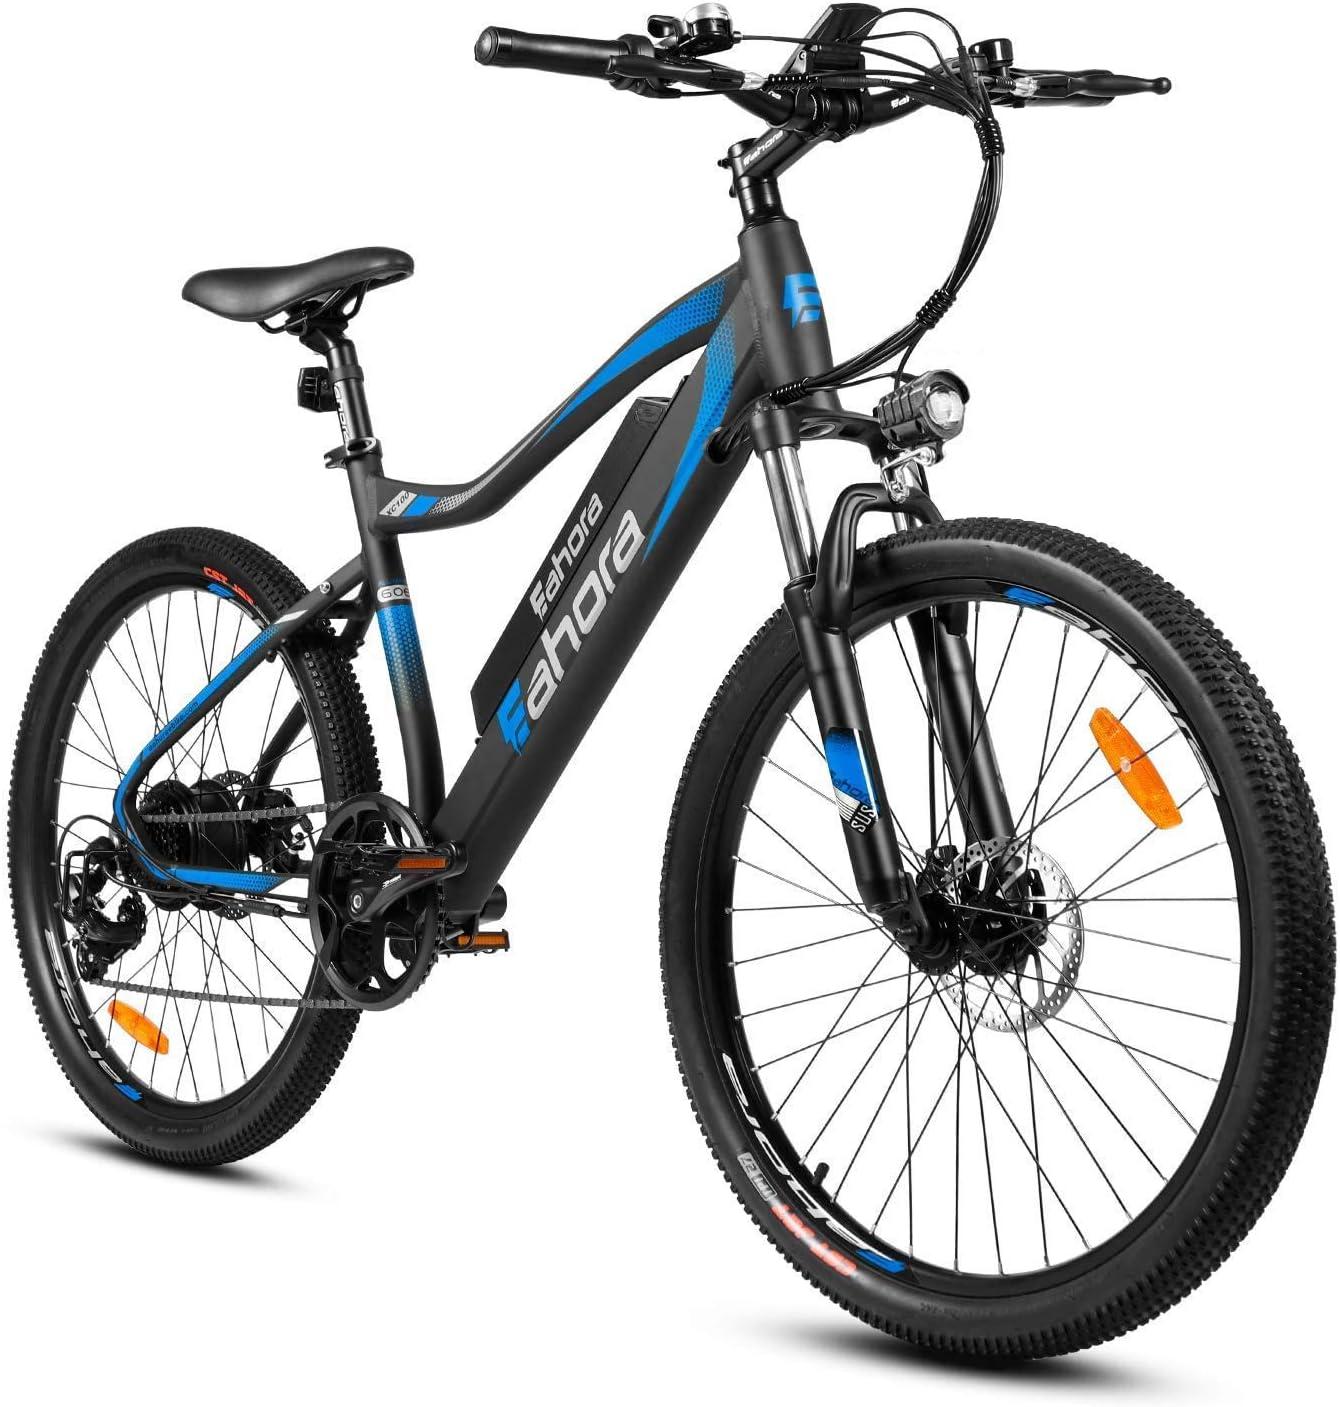 eAhora XC100 Plus 22 MPH Electric Mountain Bike Year-end annual account Sales 14